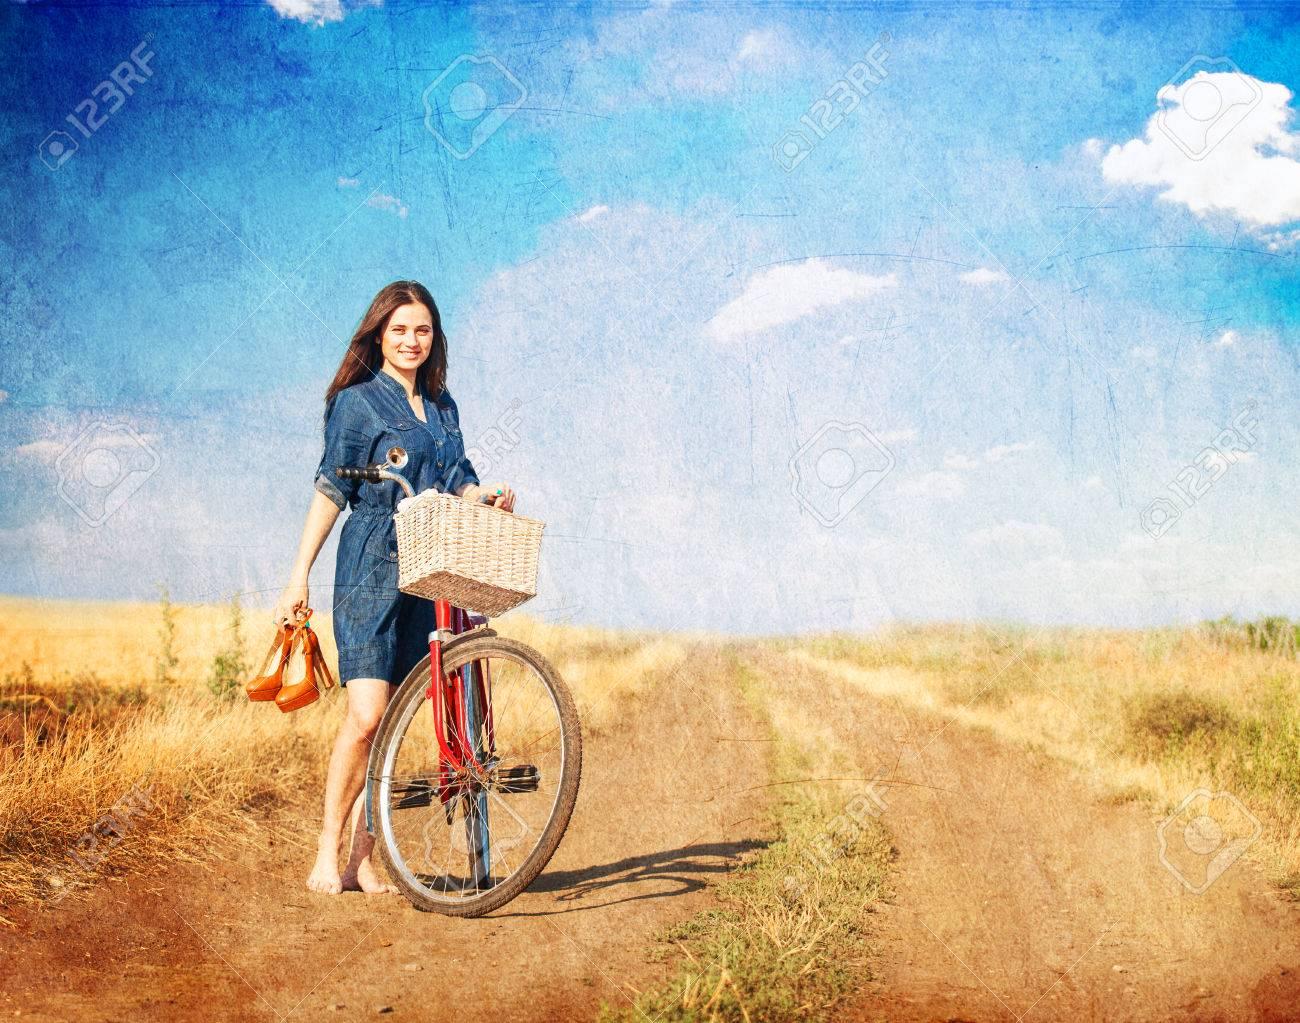 https://previews.123rf.com/images/massonforstock/massonforstock1407/massonforstock140700006/29793441-brunette-girl-with-bycicle-on-countryside-road-.jpg